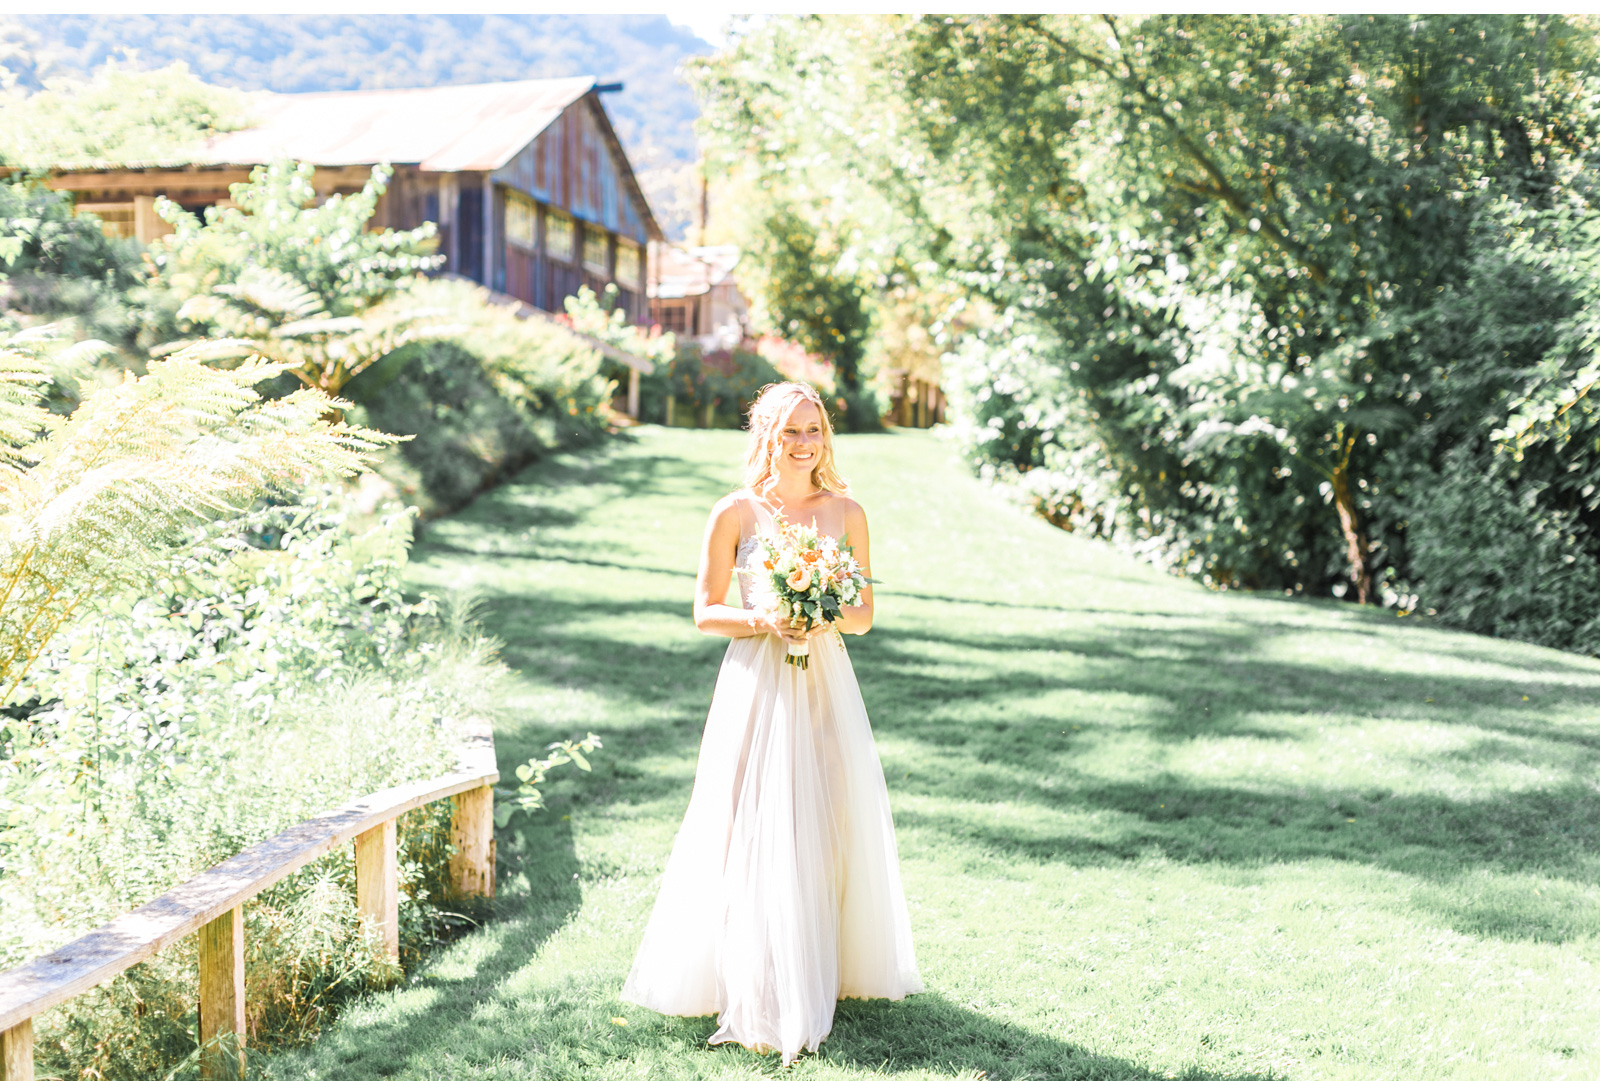 Sea-Canyon-Fruit-Ranch-Wedding-Natalie-Schutt-Photography_09.jpg